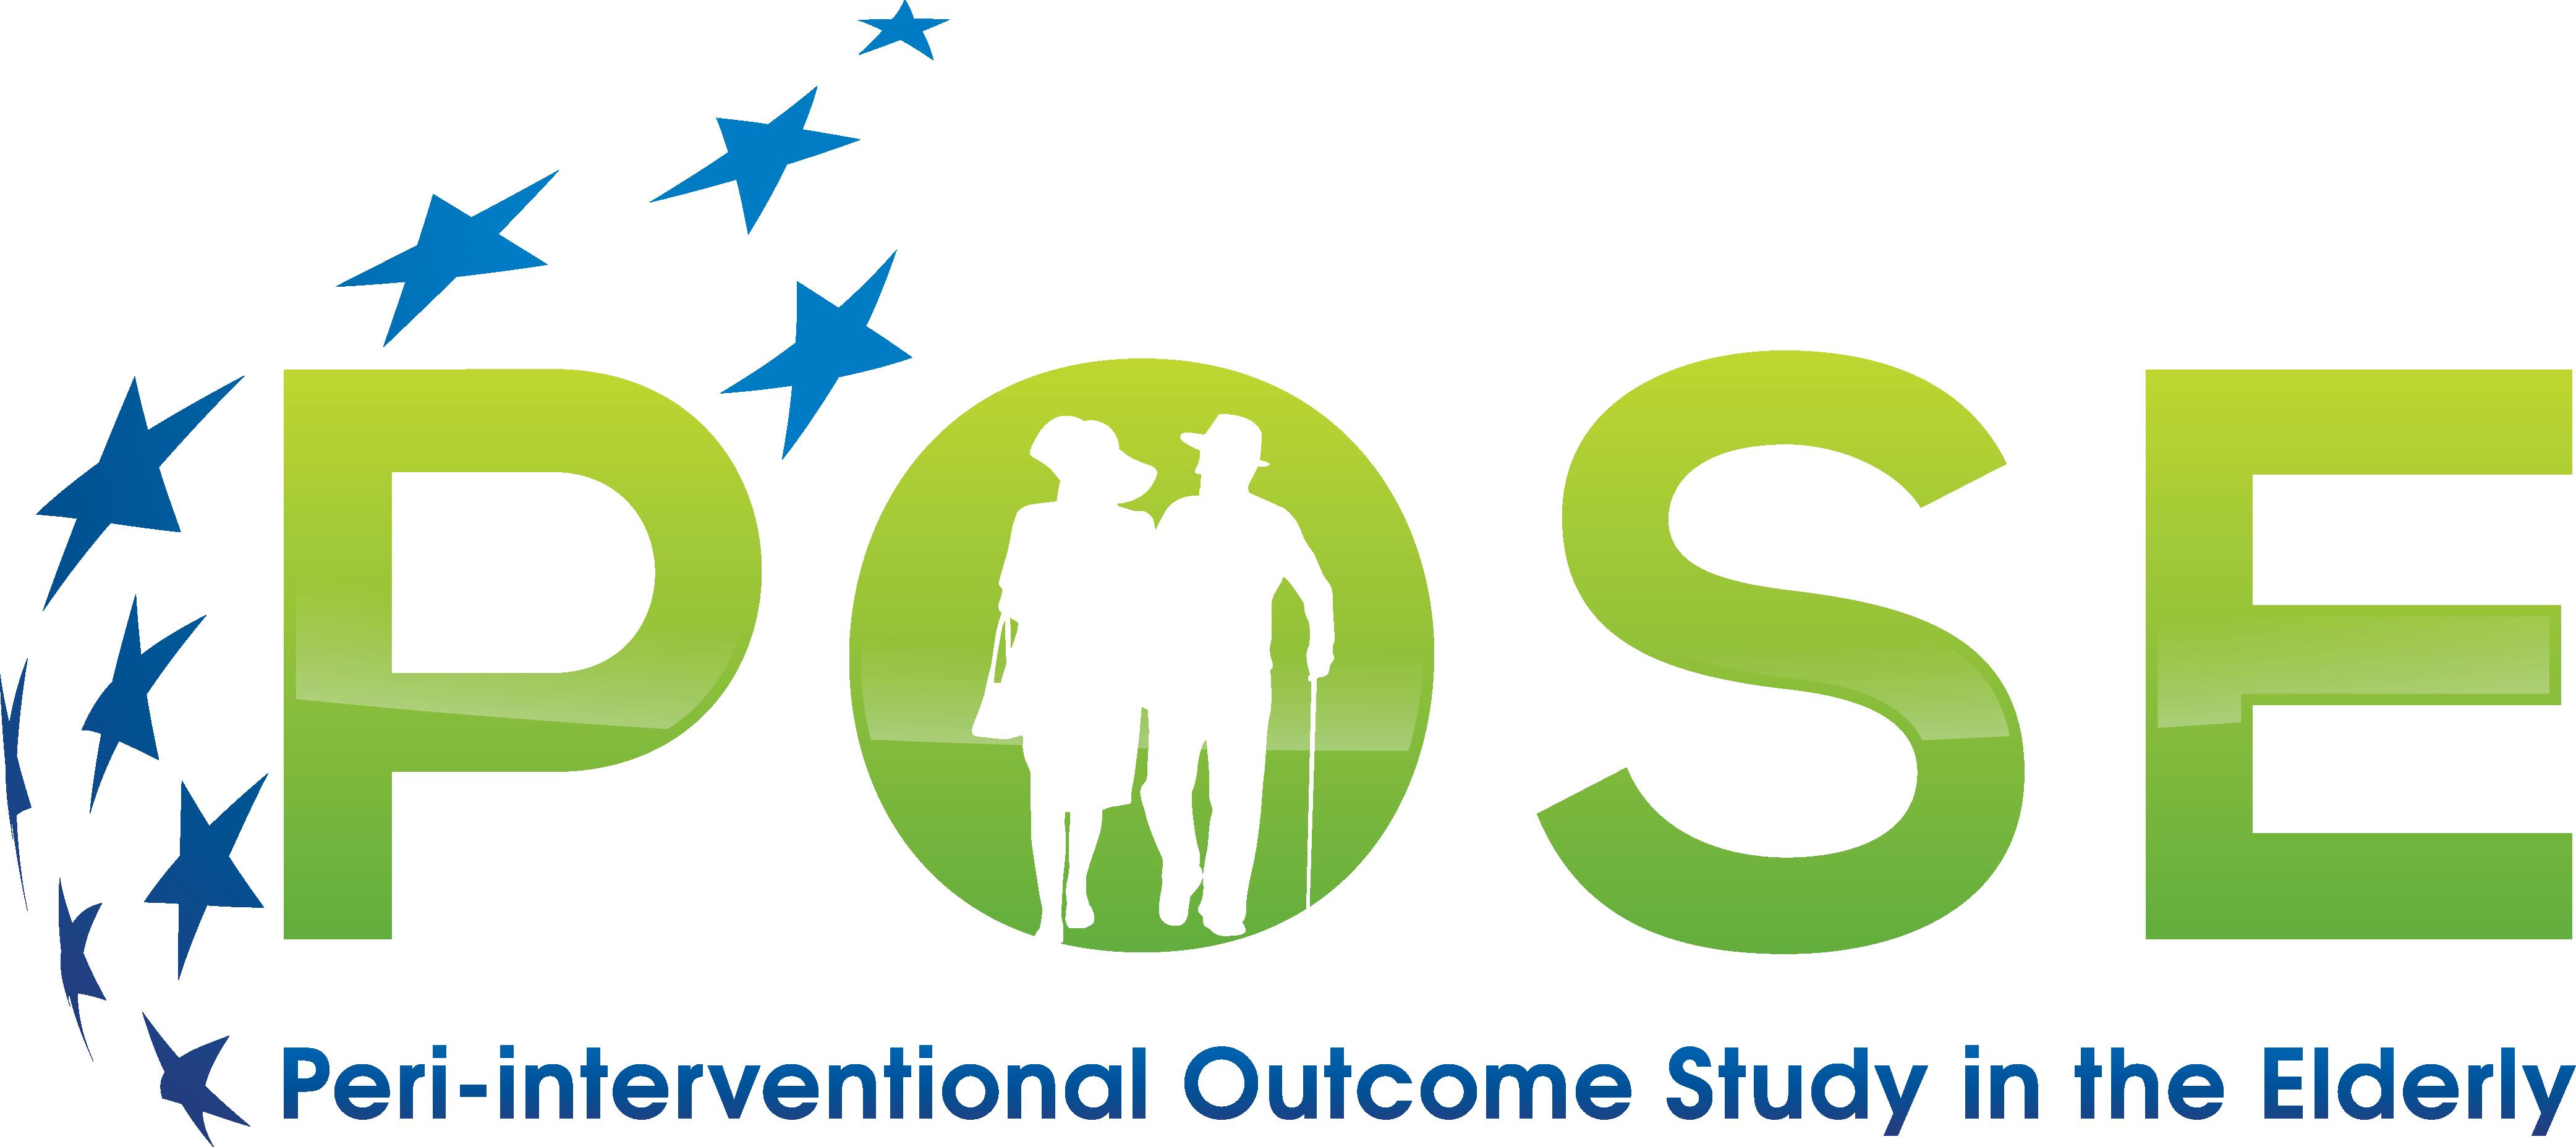 Logo for an European clinical study